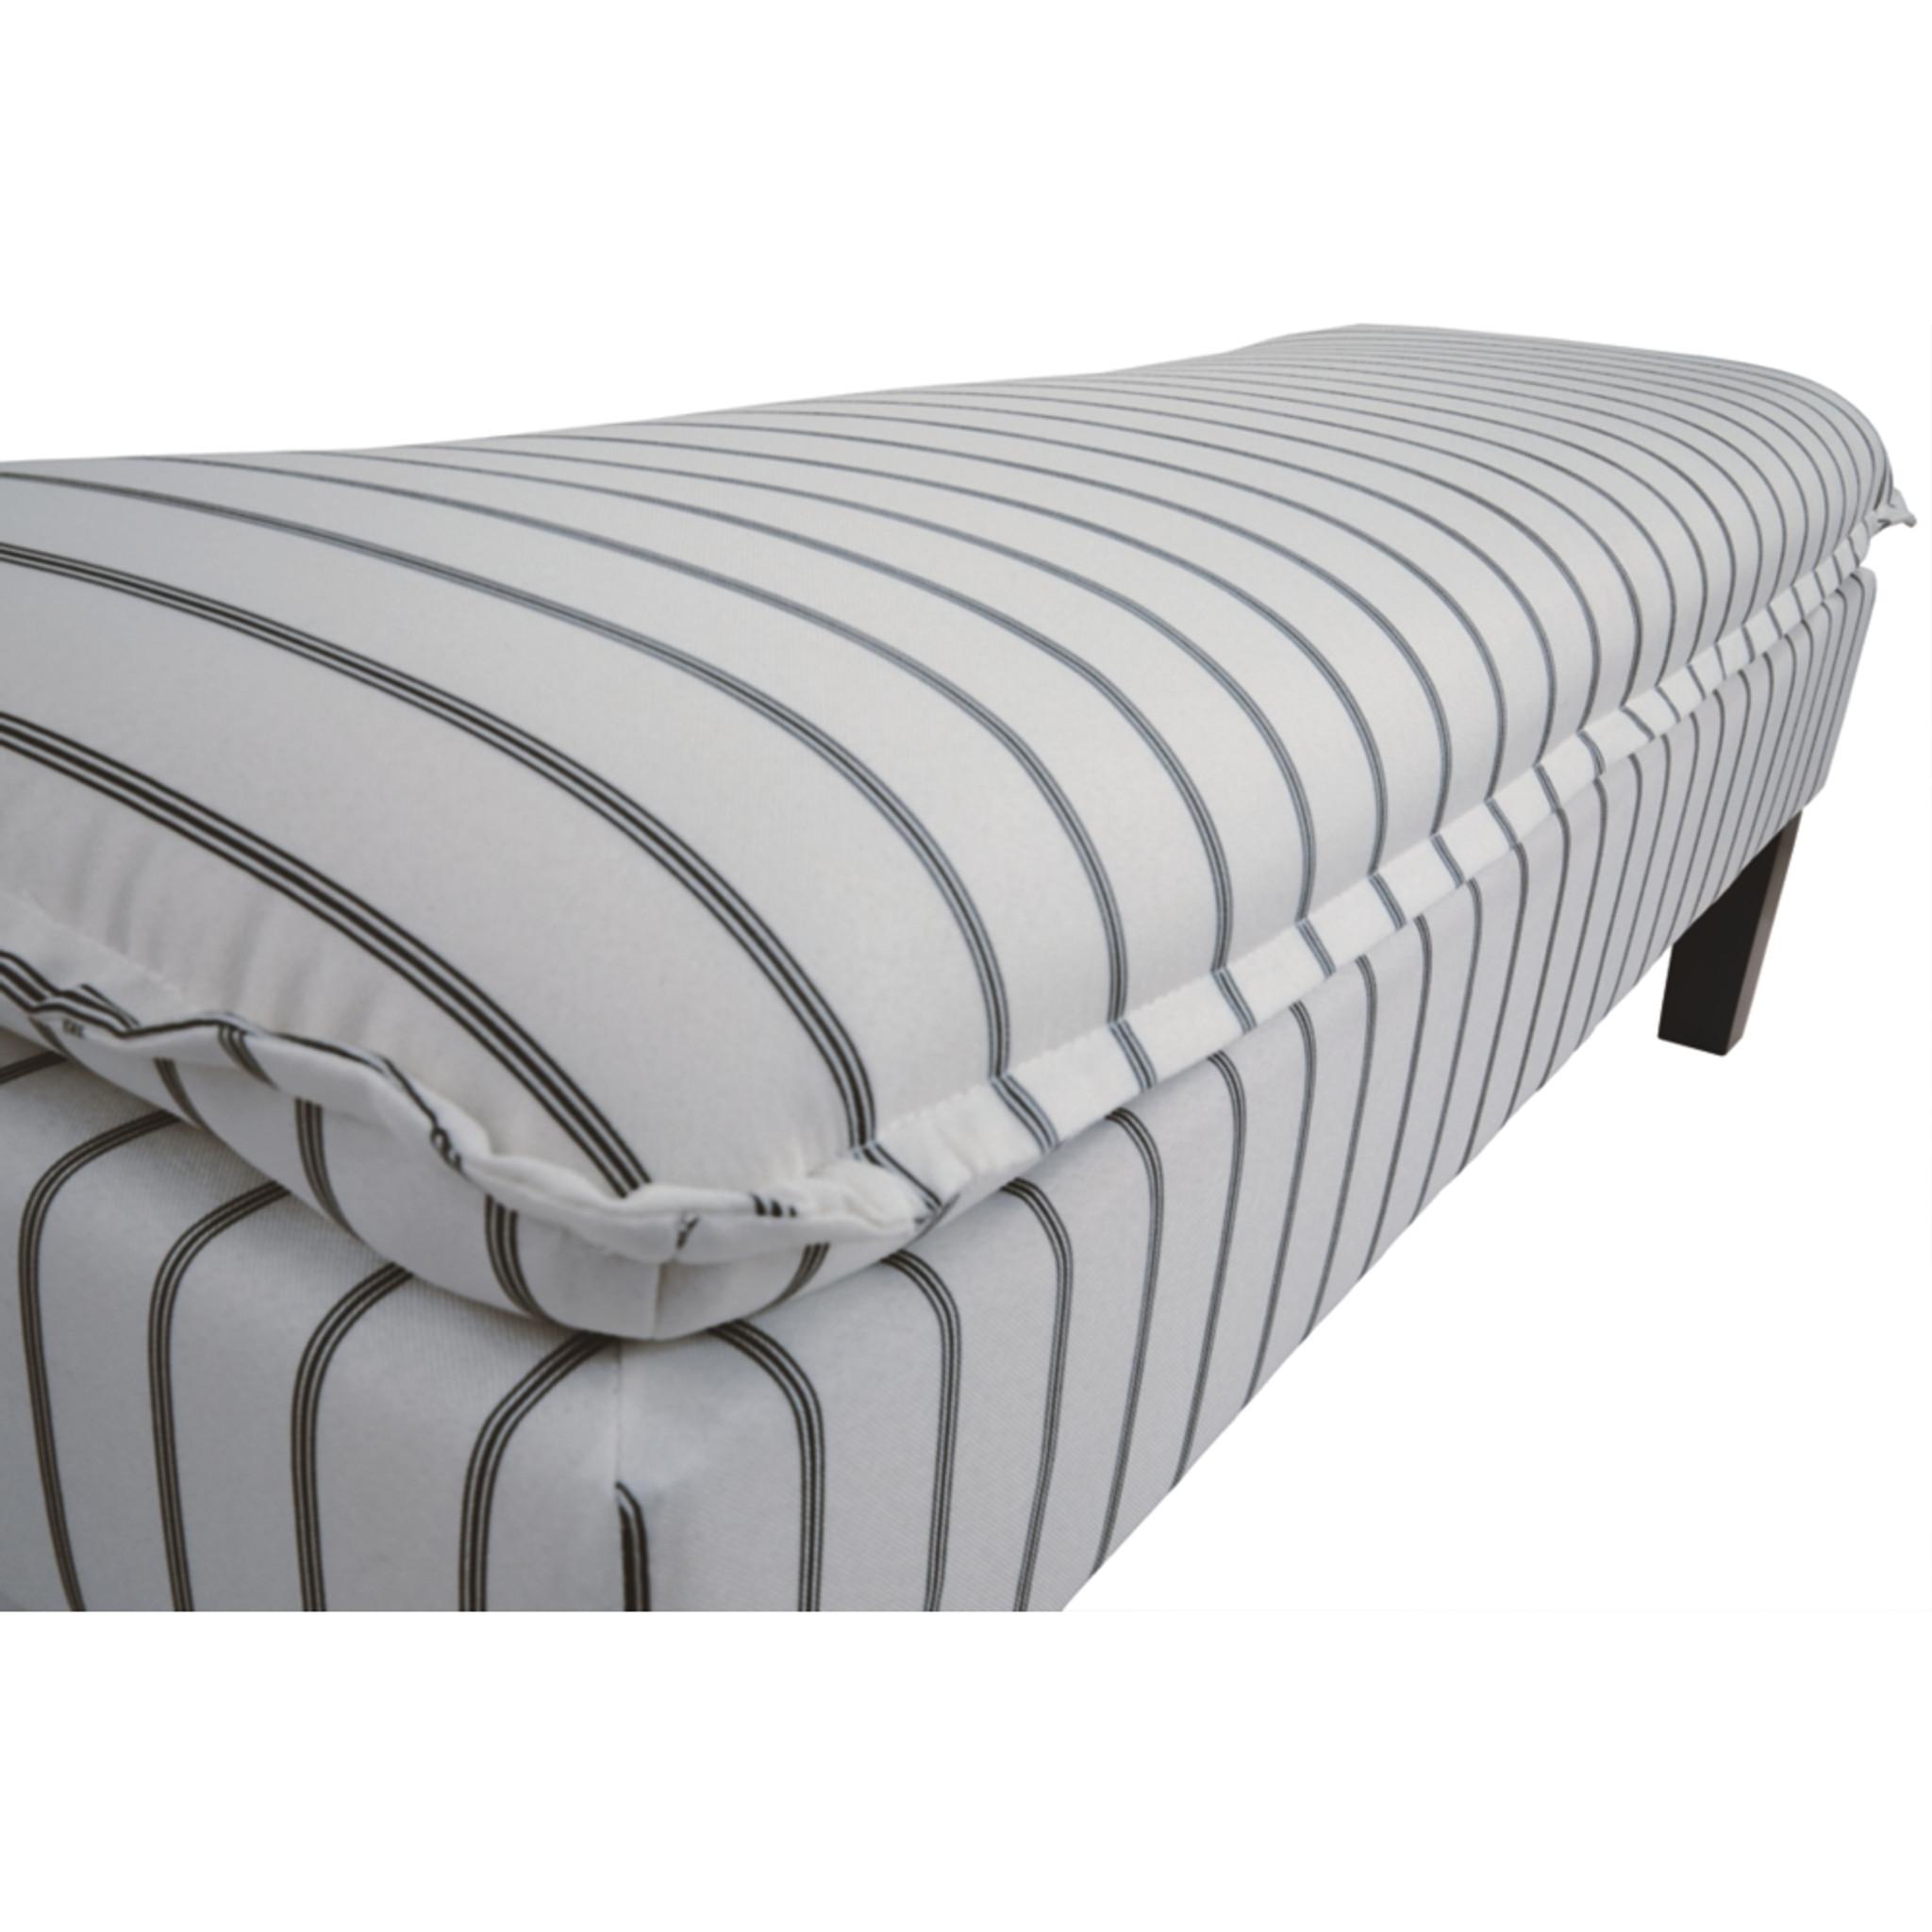 Super Arrowrock White Grey Accent Bench Creativecarmelina Interior Chair Design Creativecarmelinacom